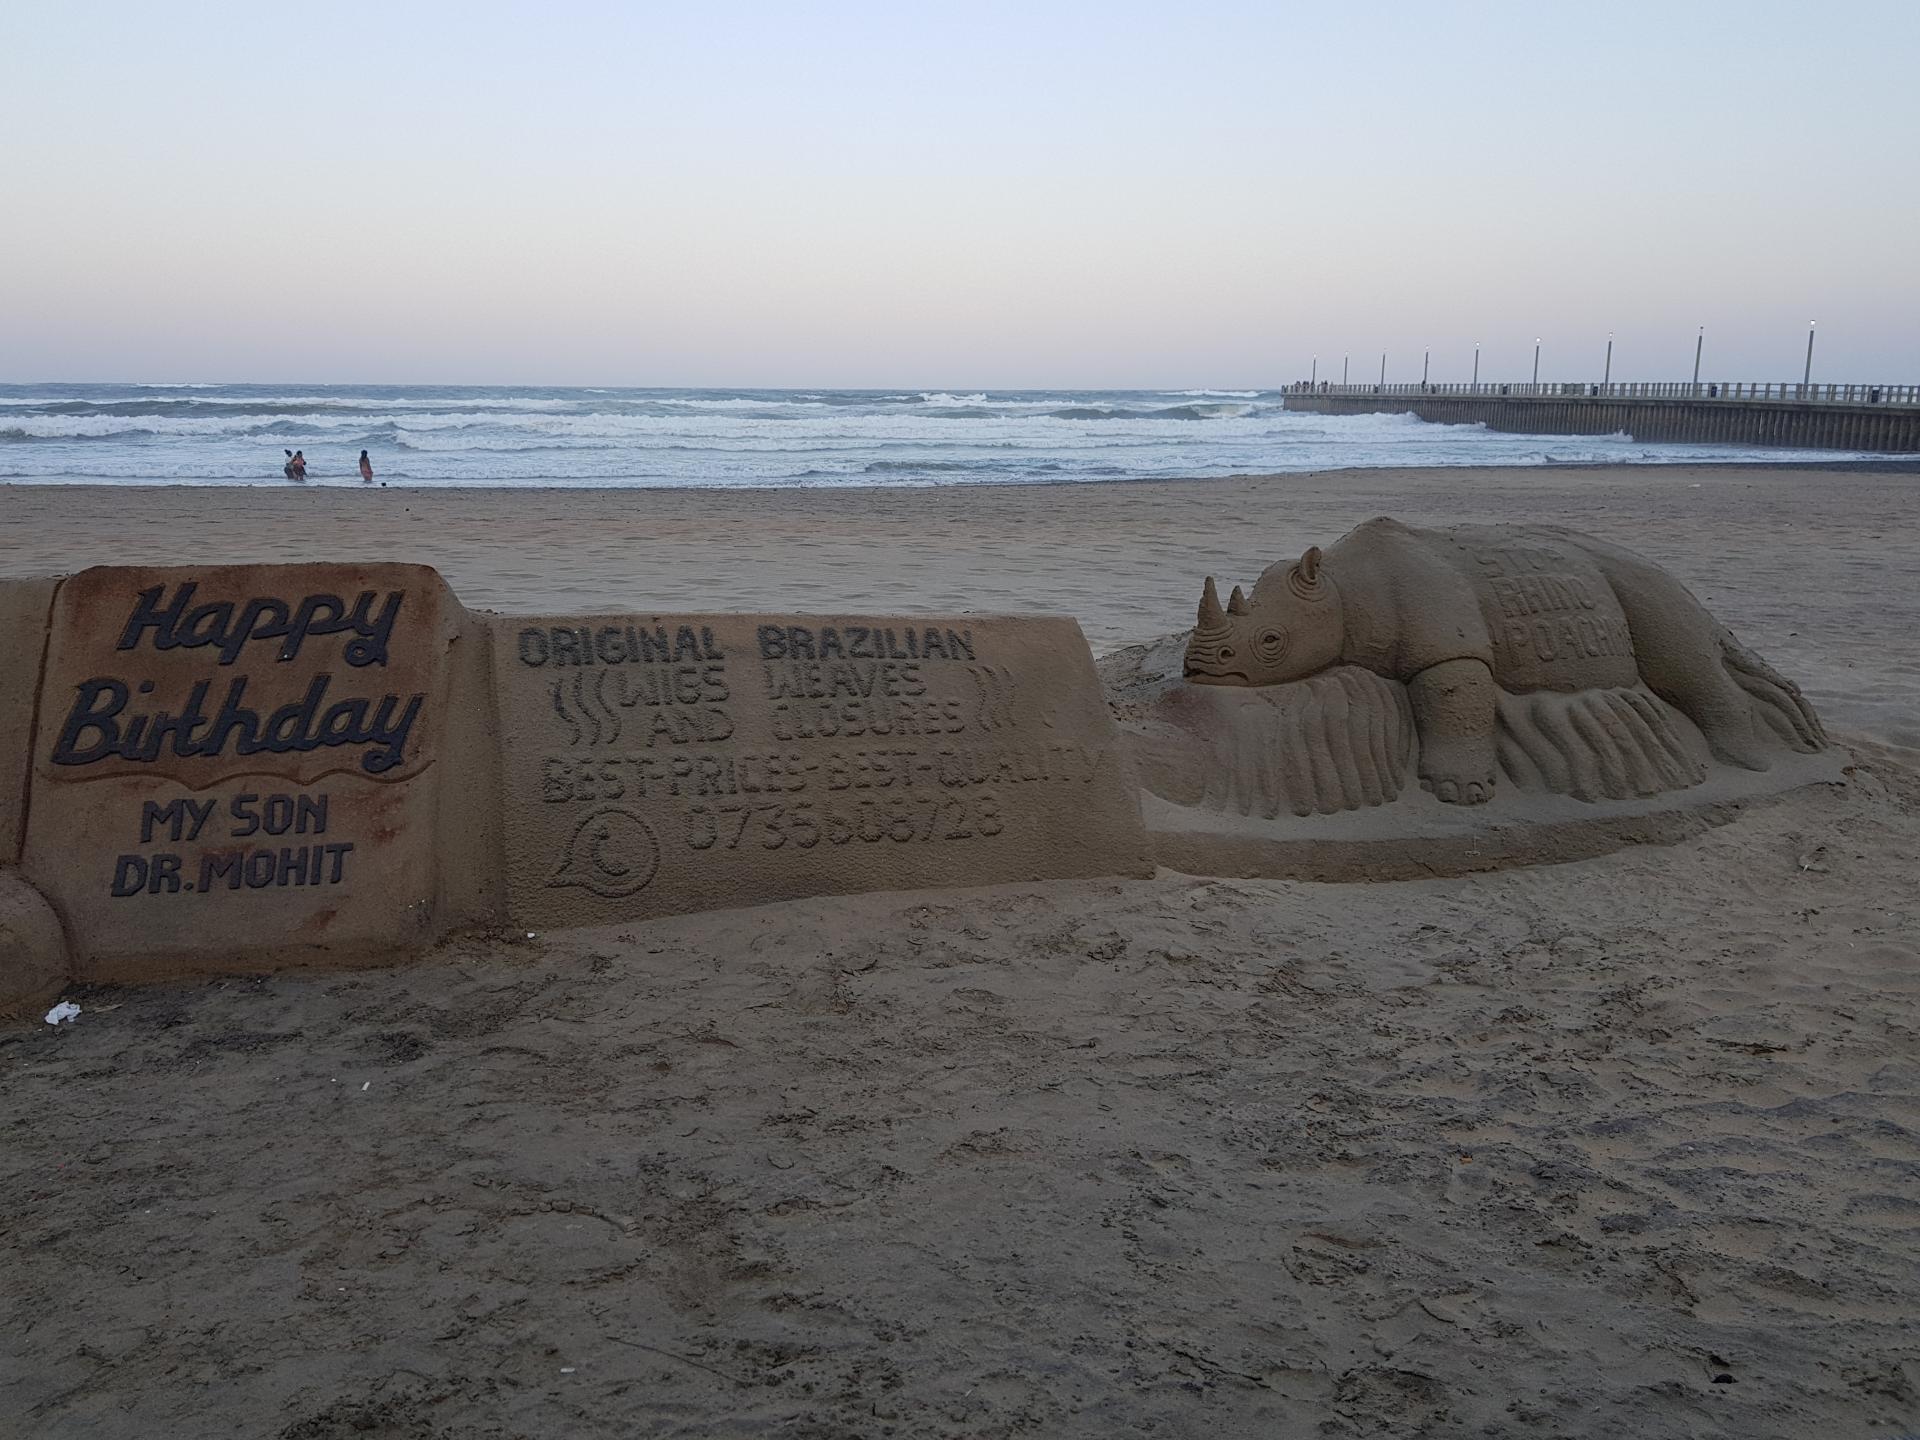 скульптуры из песка на пляже Дурбана, ЮАР